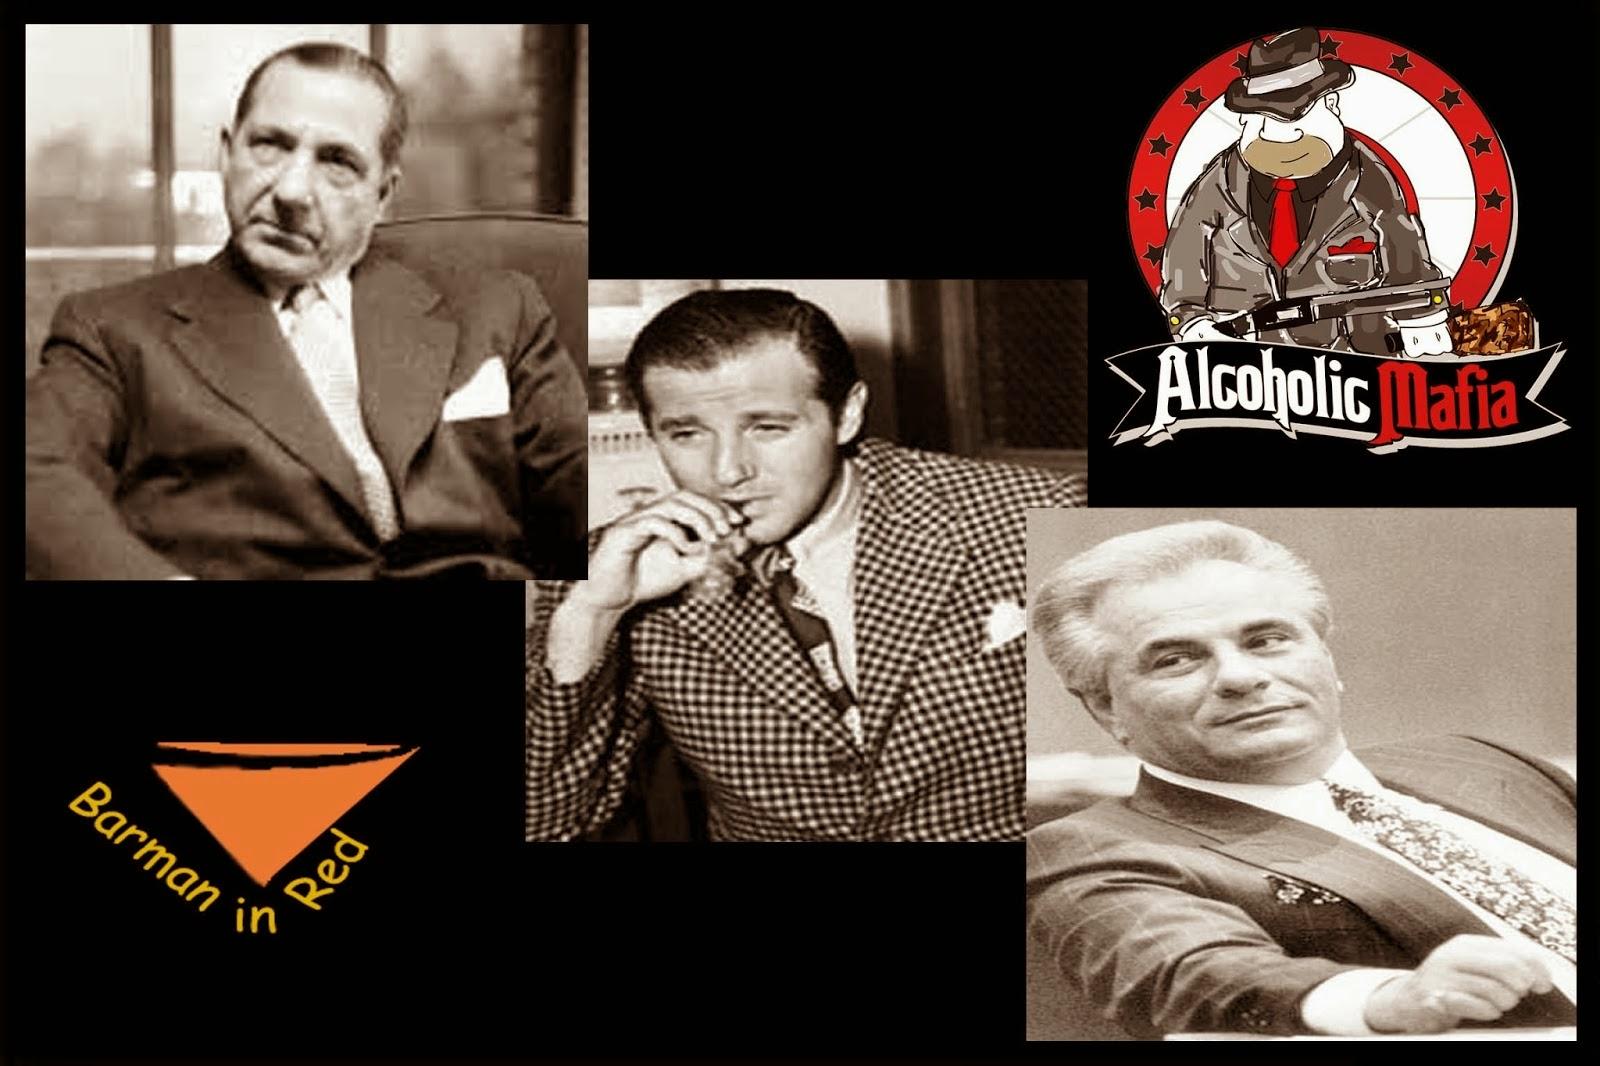 Mafia y Alcohol